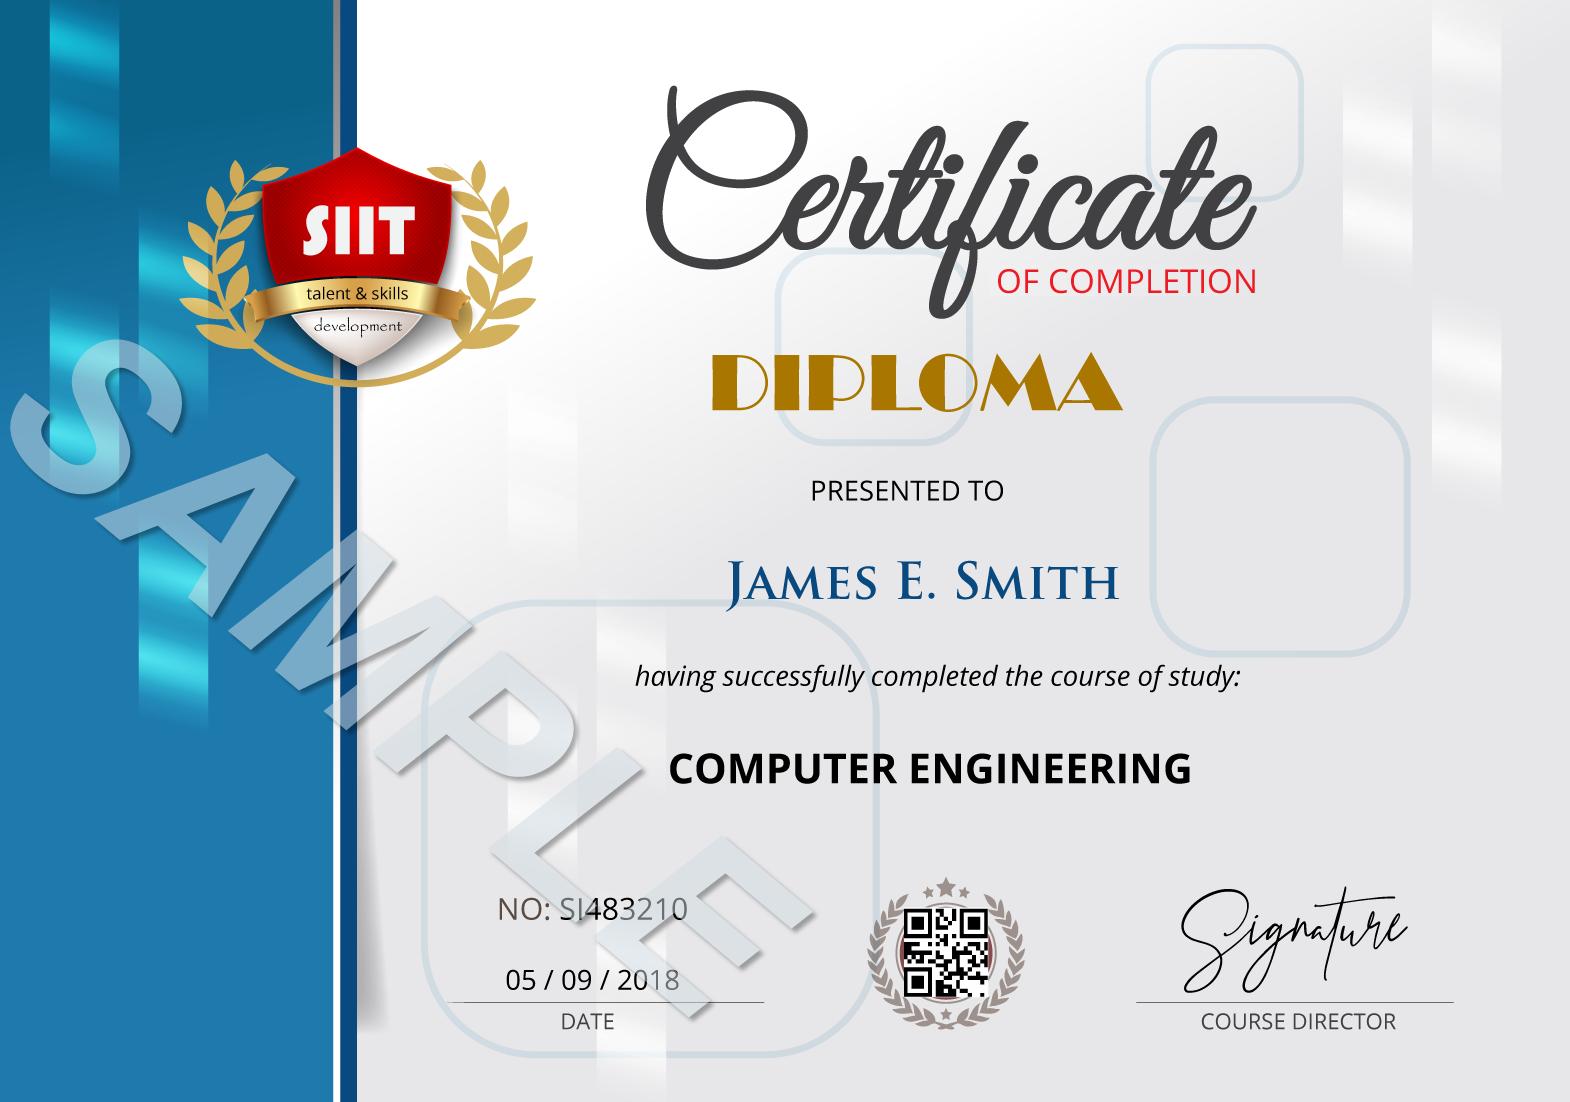 Siitgo Scholars Institute Of Information Technology Online